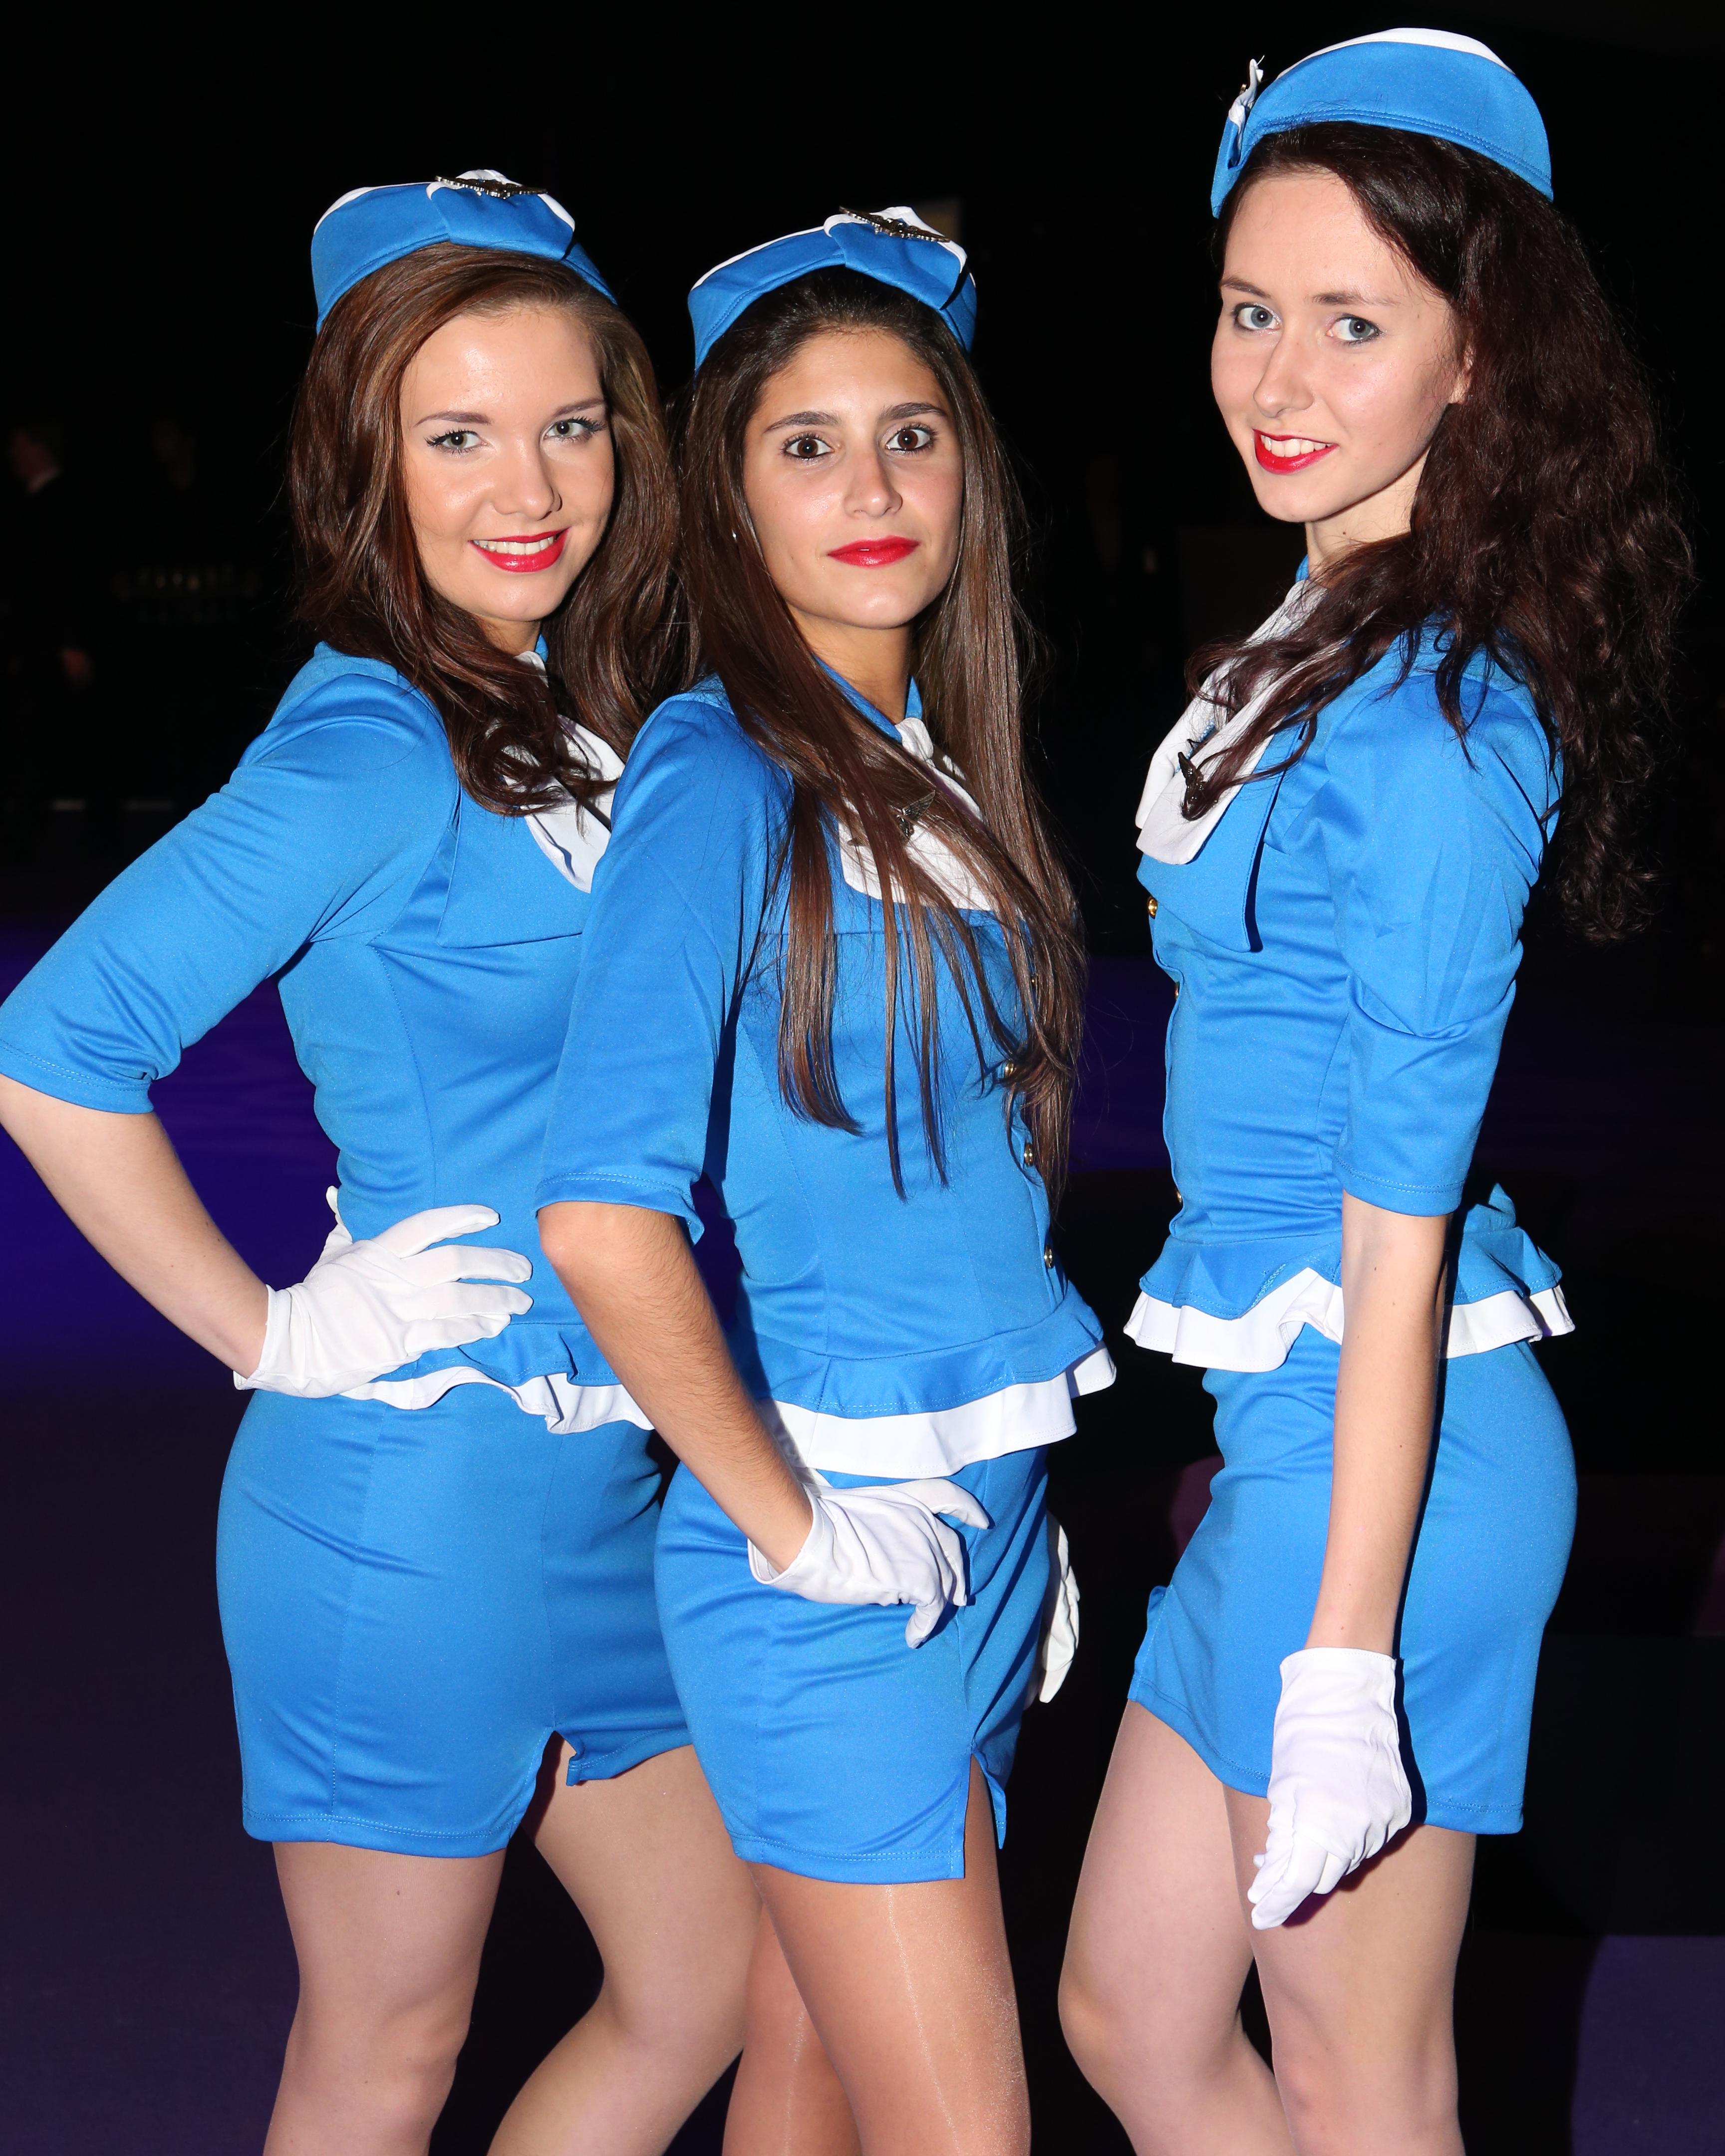 B2B Marketing air stewardesses